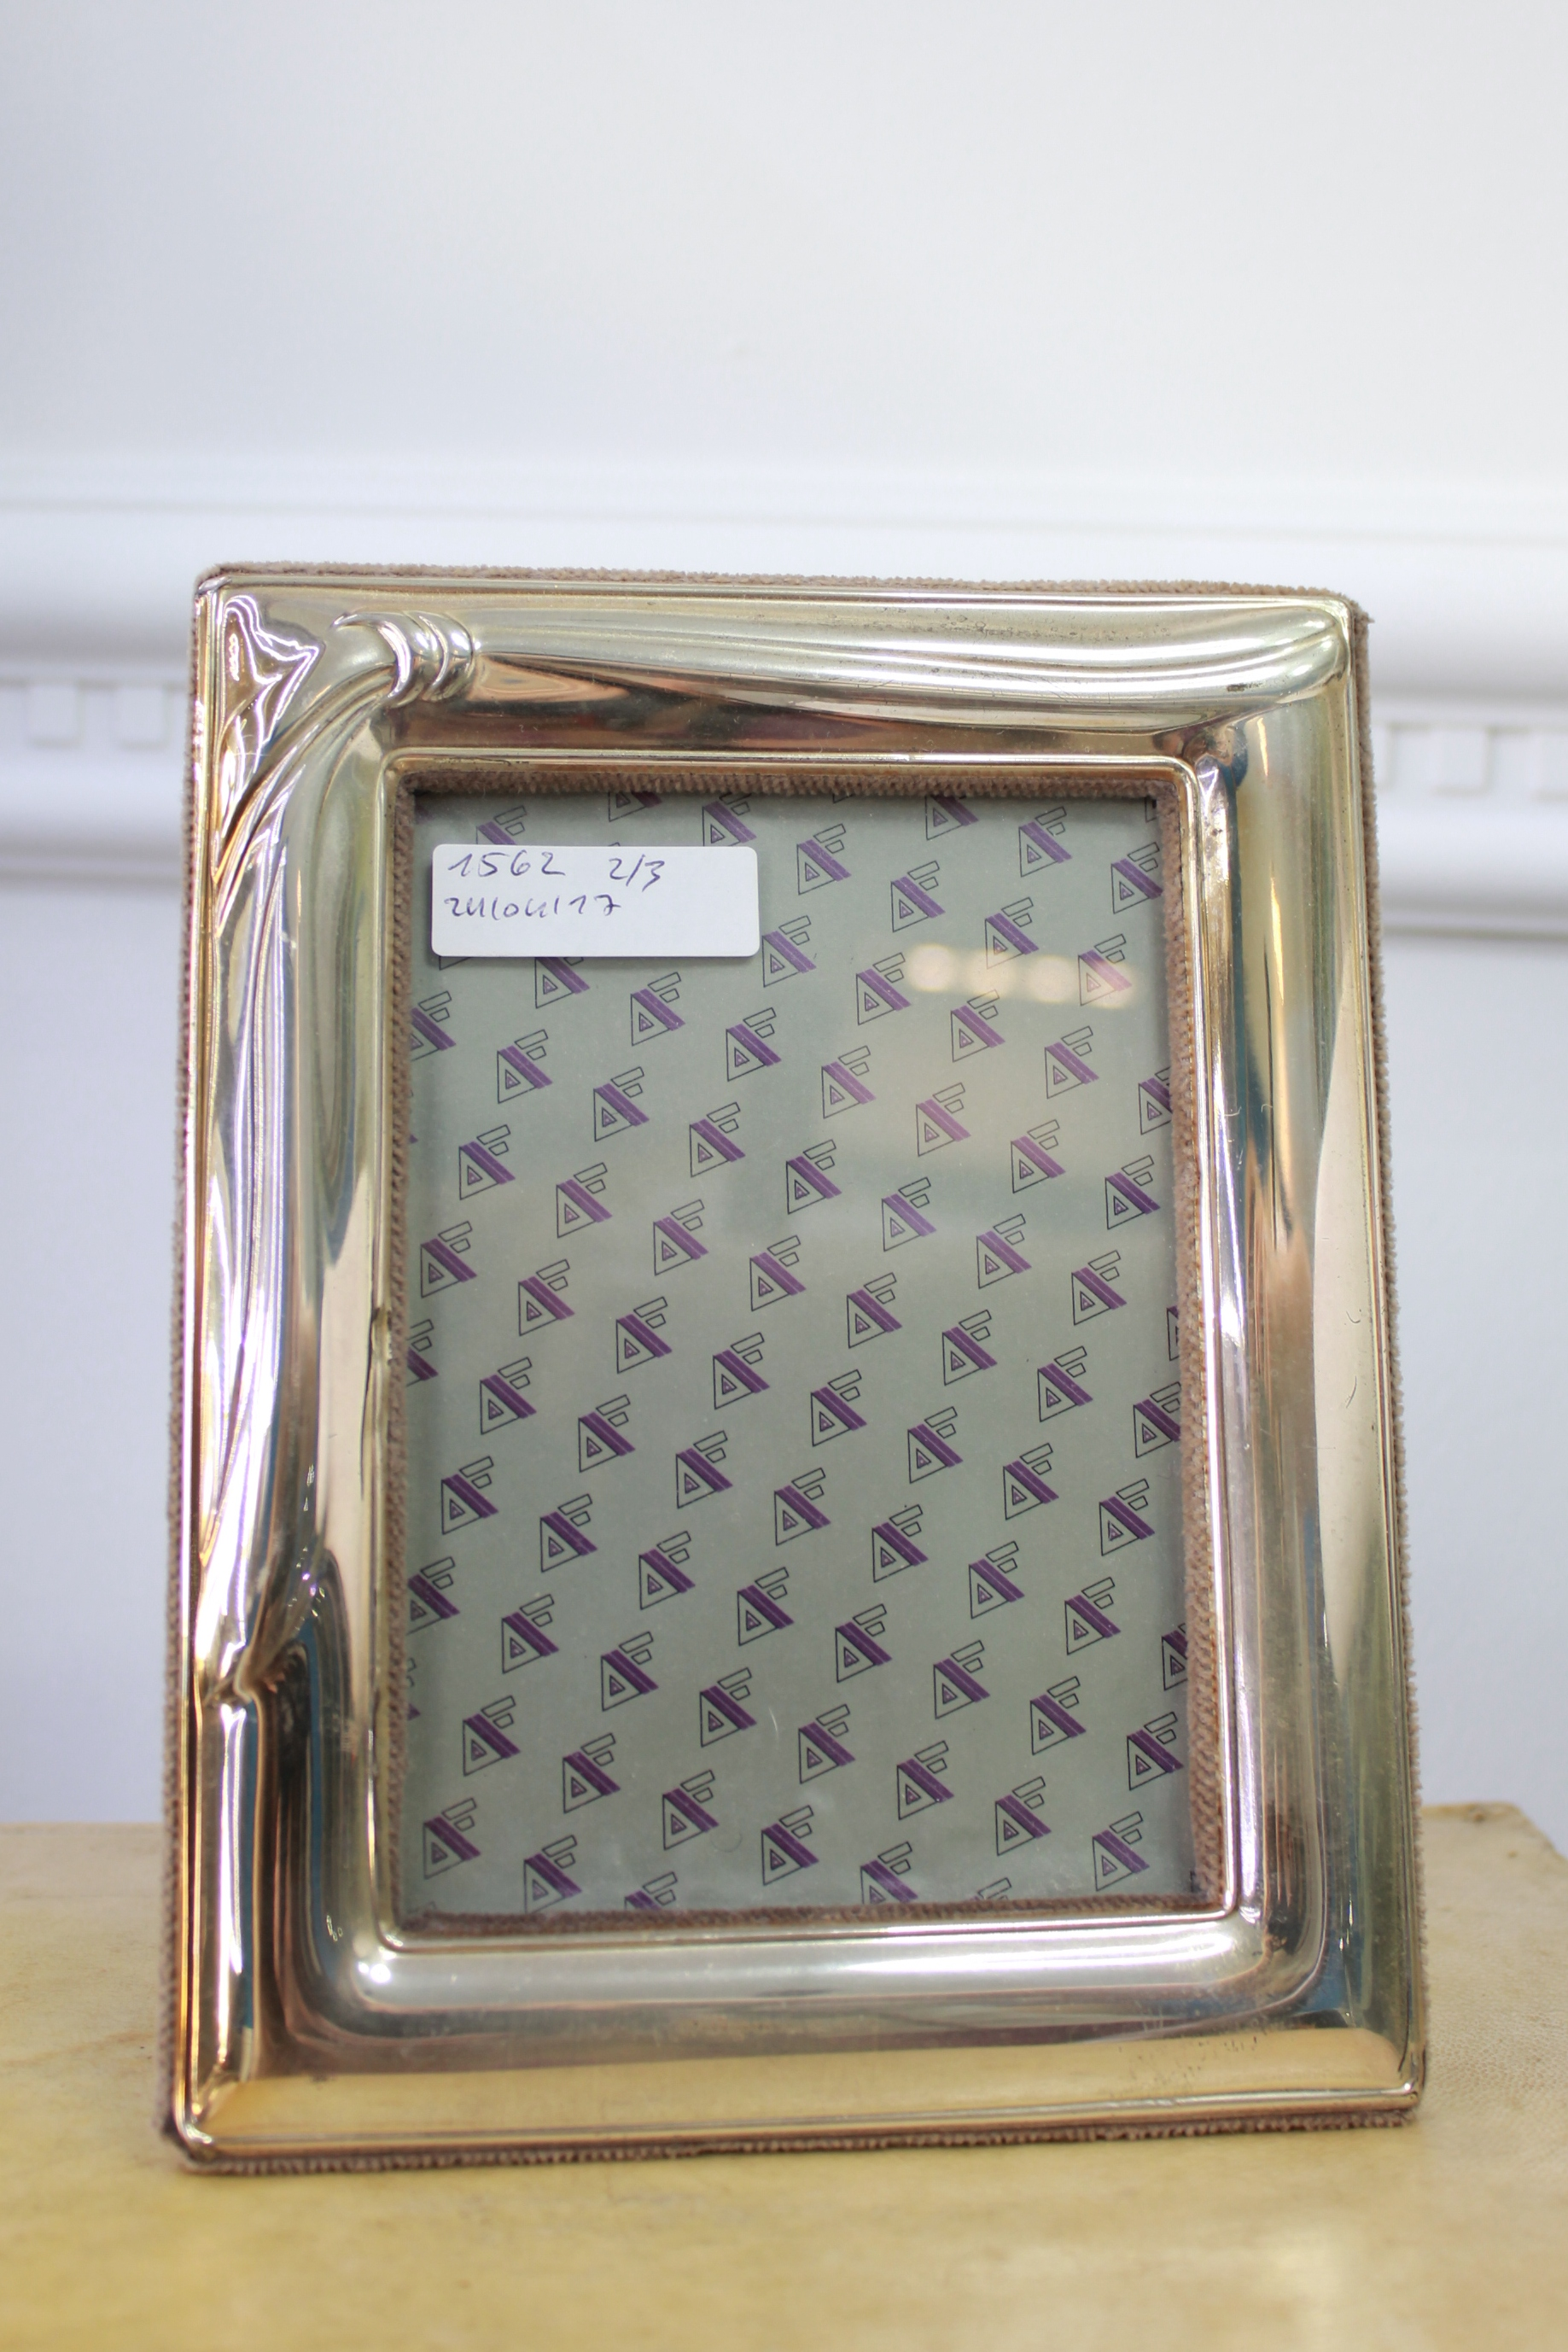 Cornice in argento idee regalo 0023